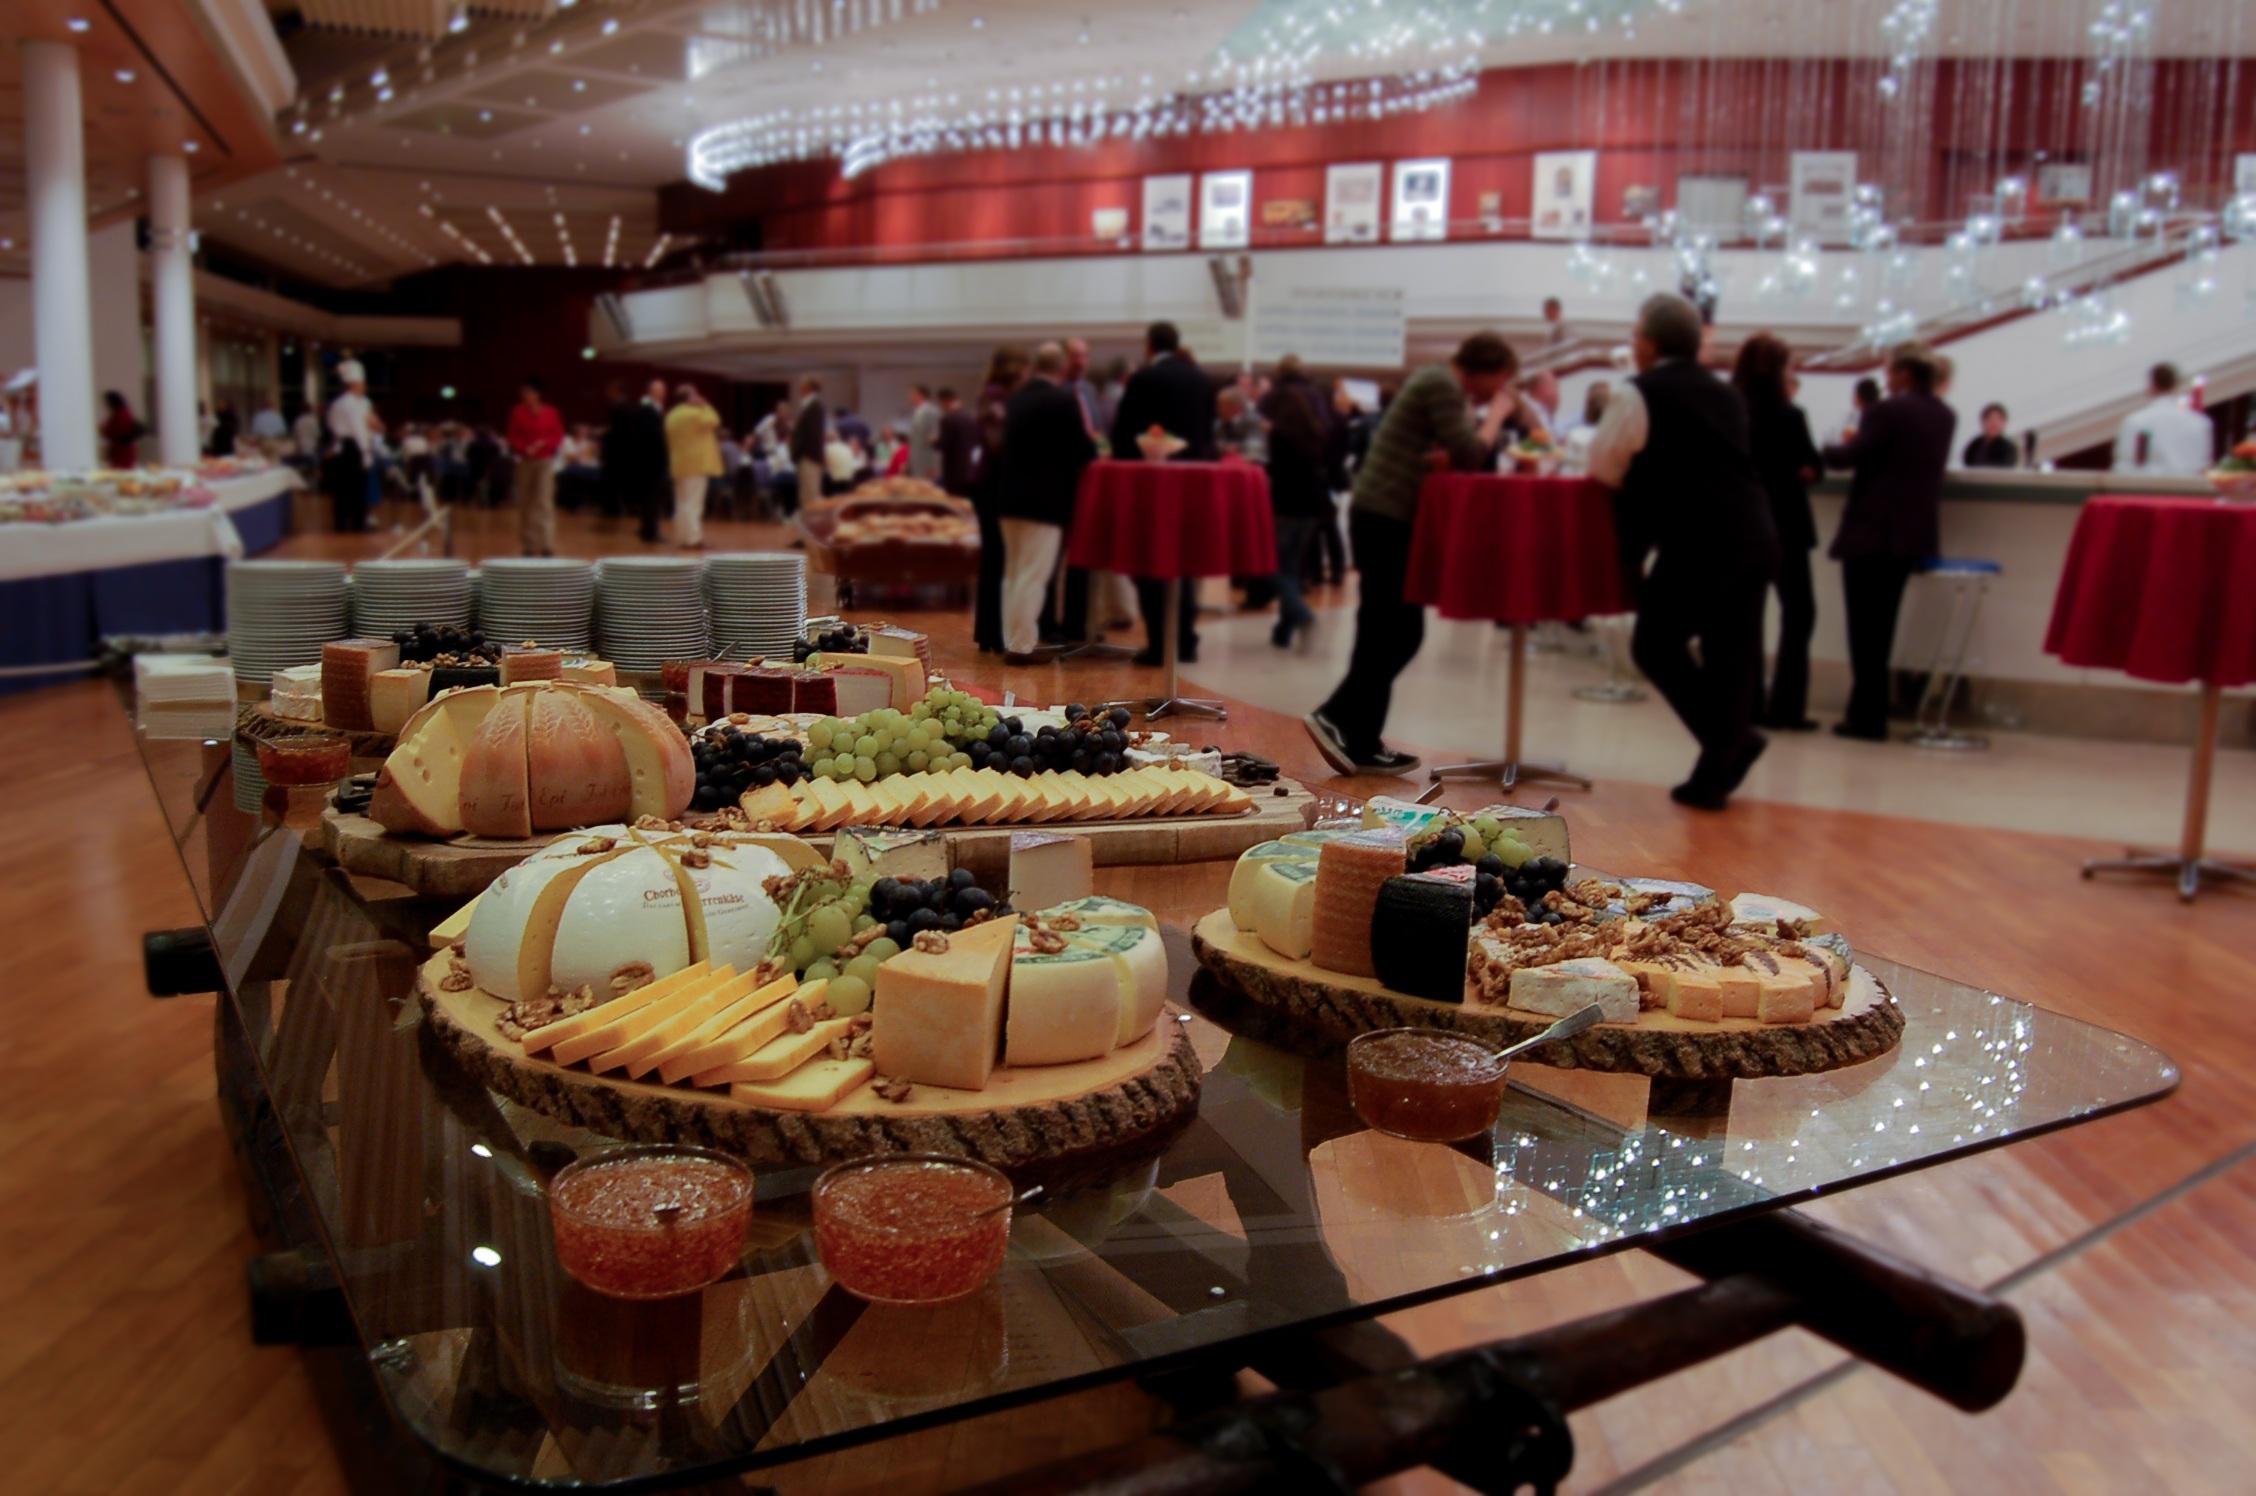 Kostenlose foto : Restaurant, Feier, Mahlzeit, Lebensmittel ...